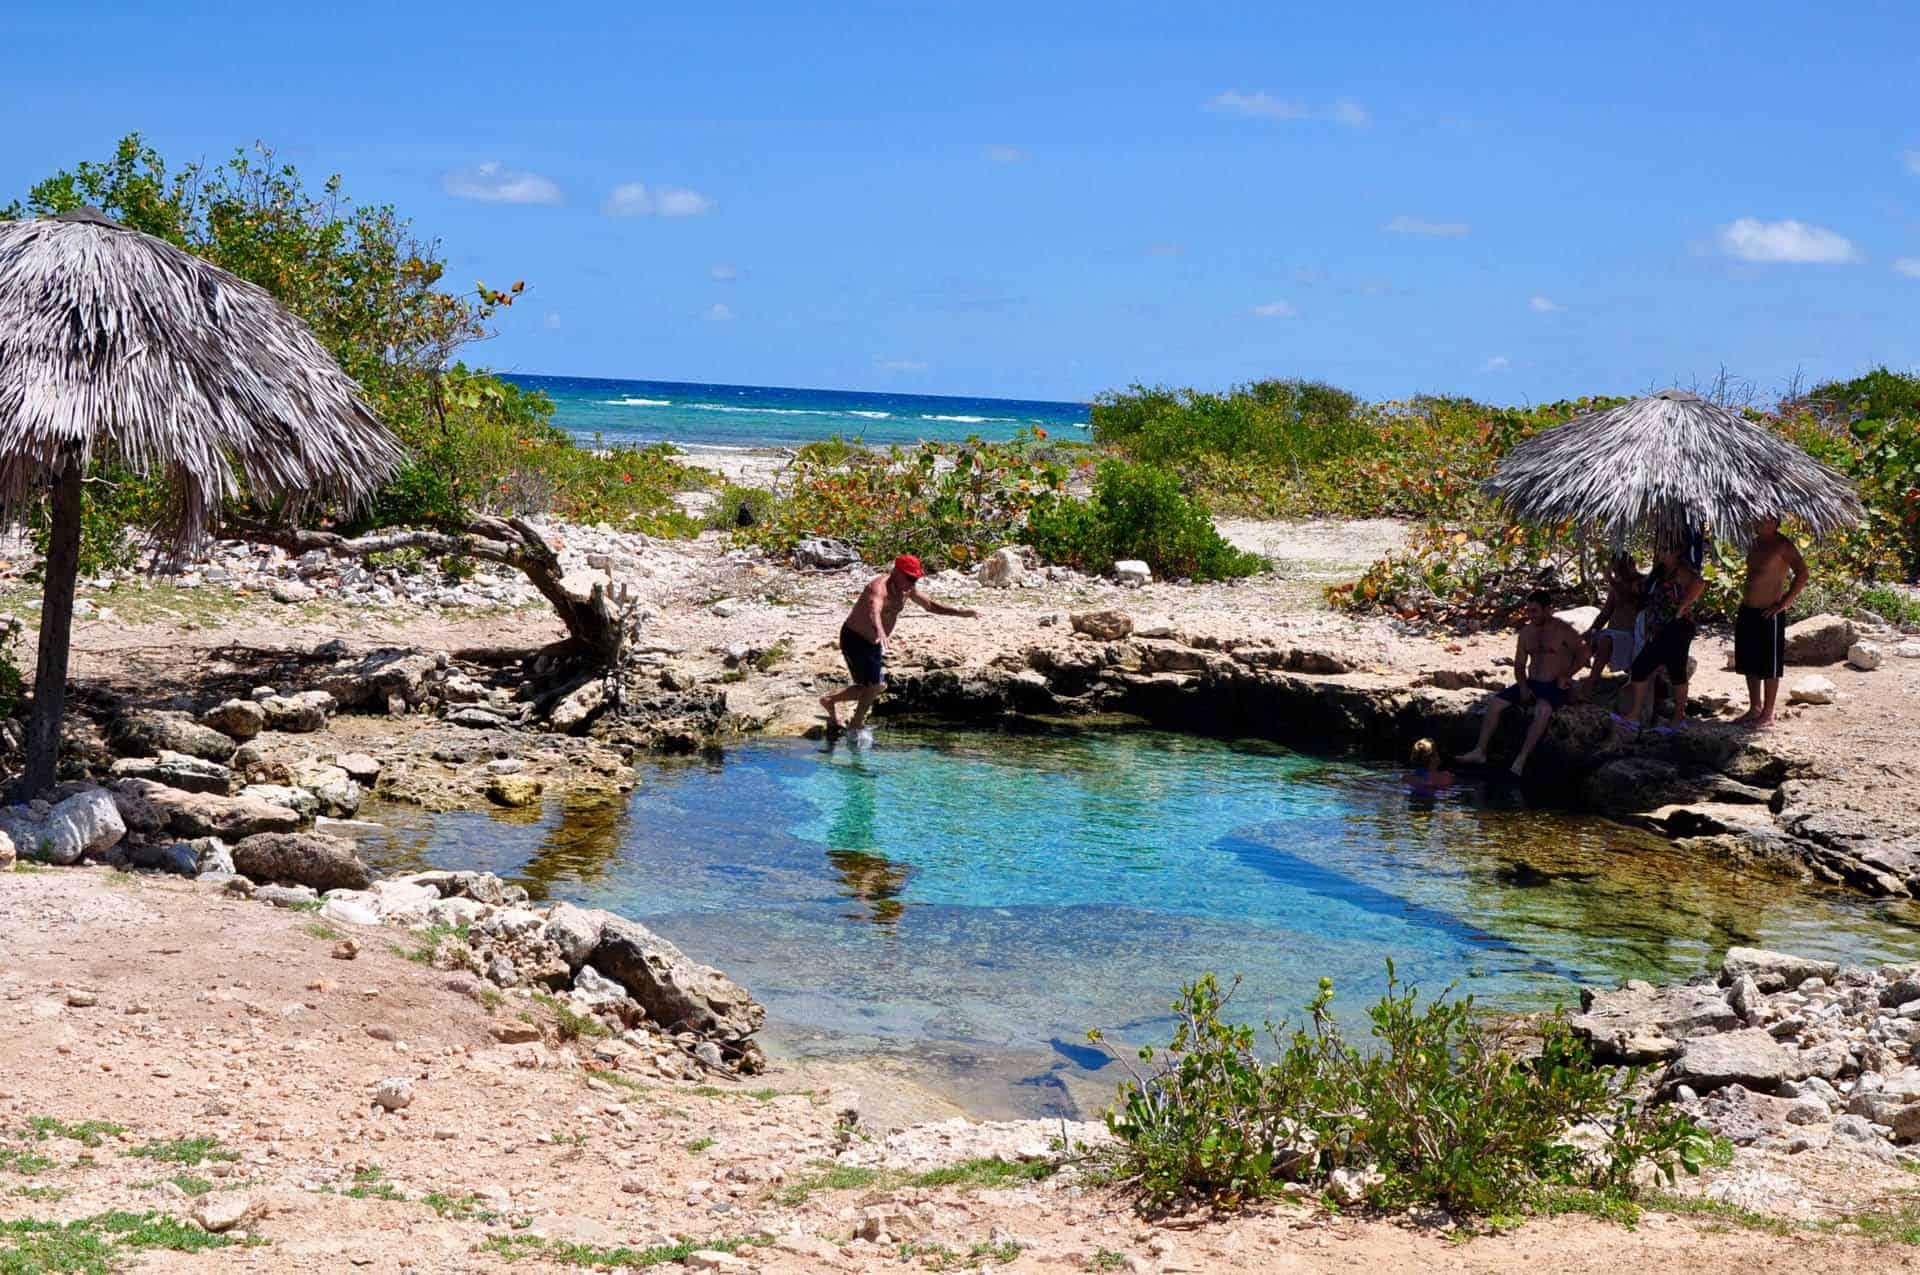 gibara cenote rochers plage cuba autrement